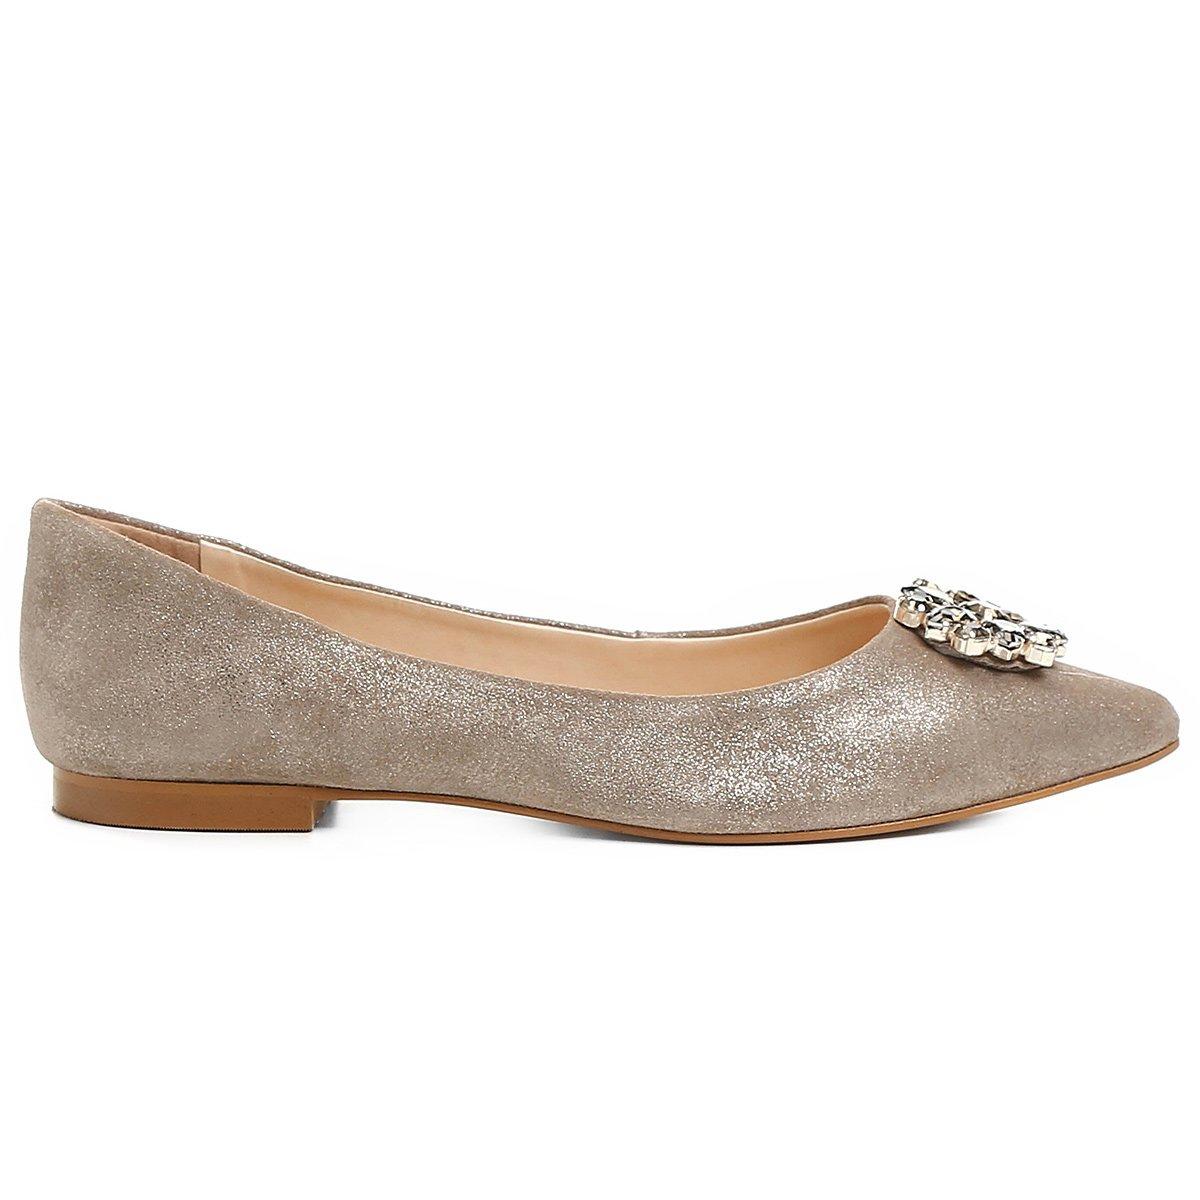 Shoestock Couro Feminina Sapatilha Sapatilha Dourado Couro Pedraria EwavWWtq